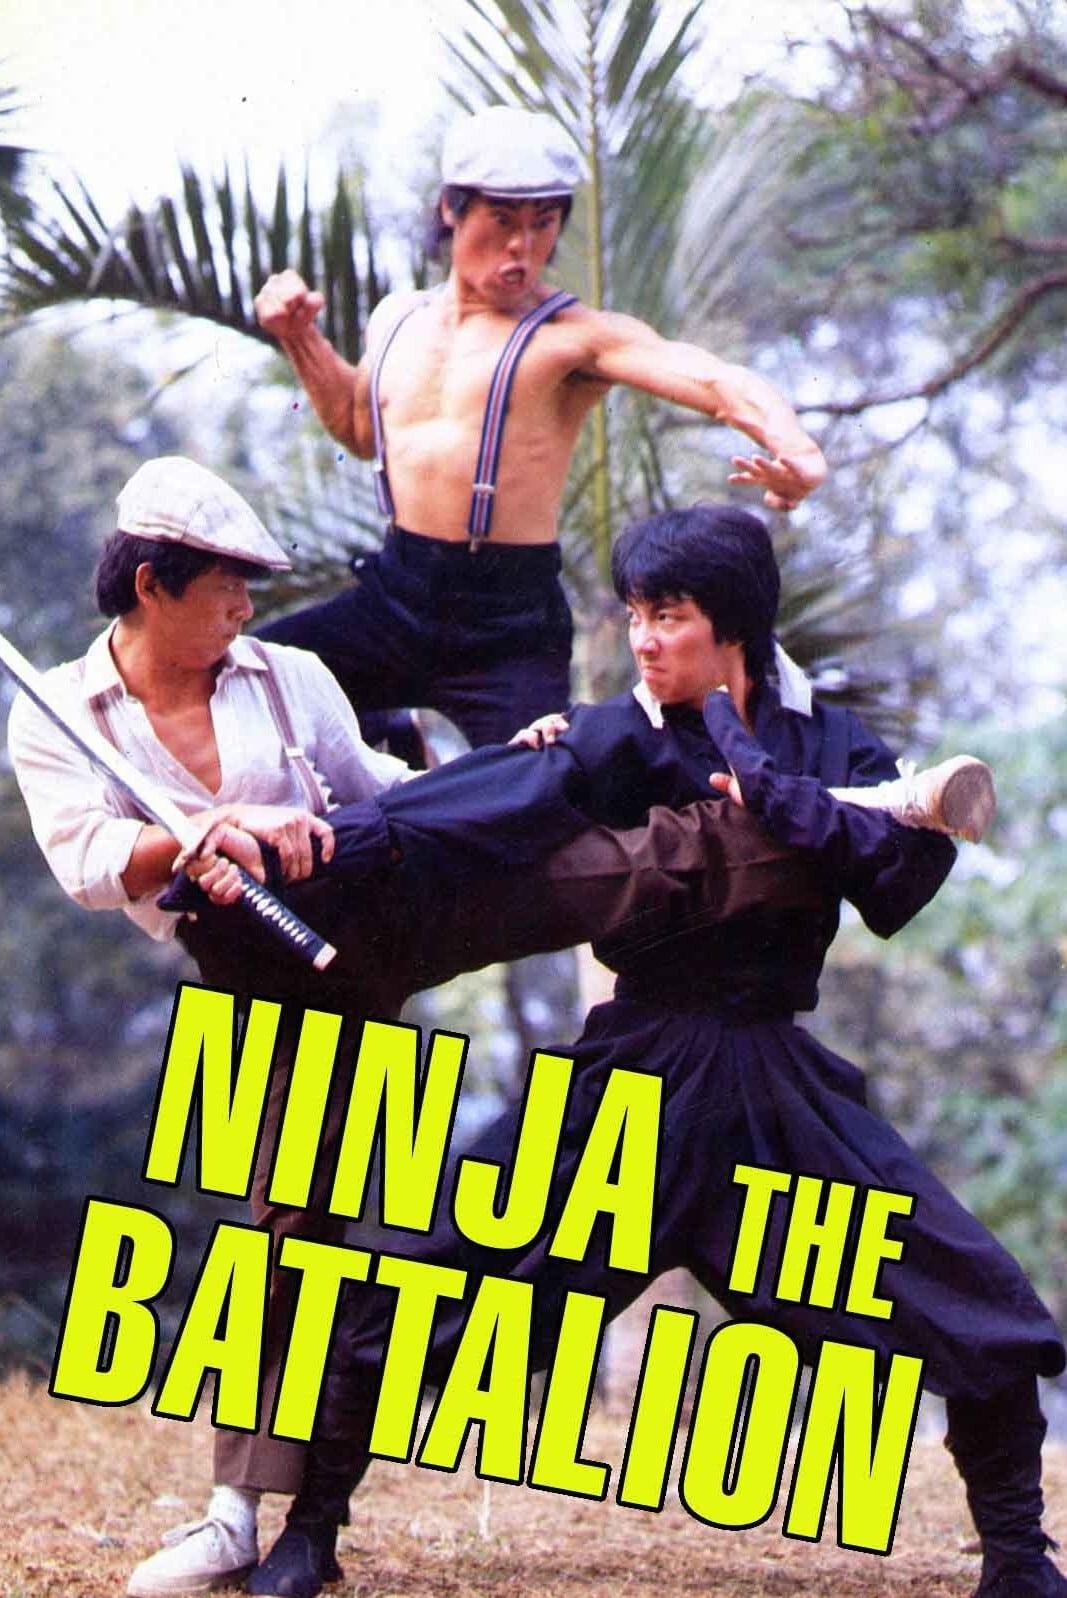 Ninja: The Battalion